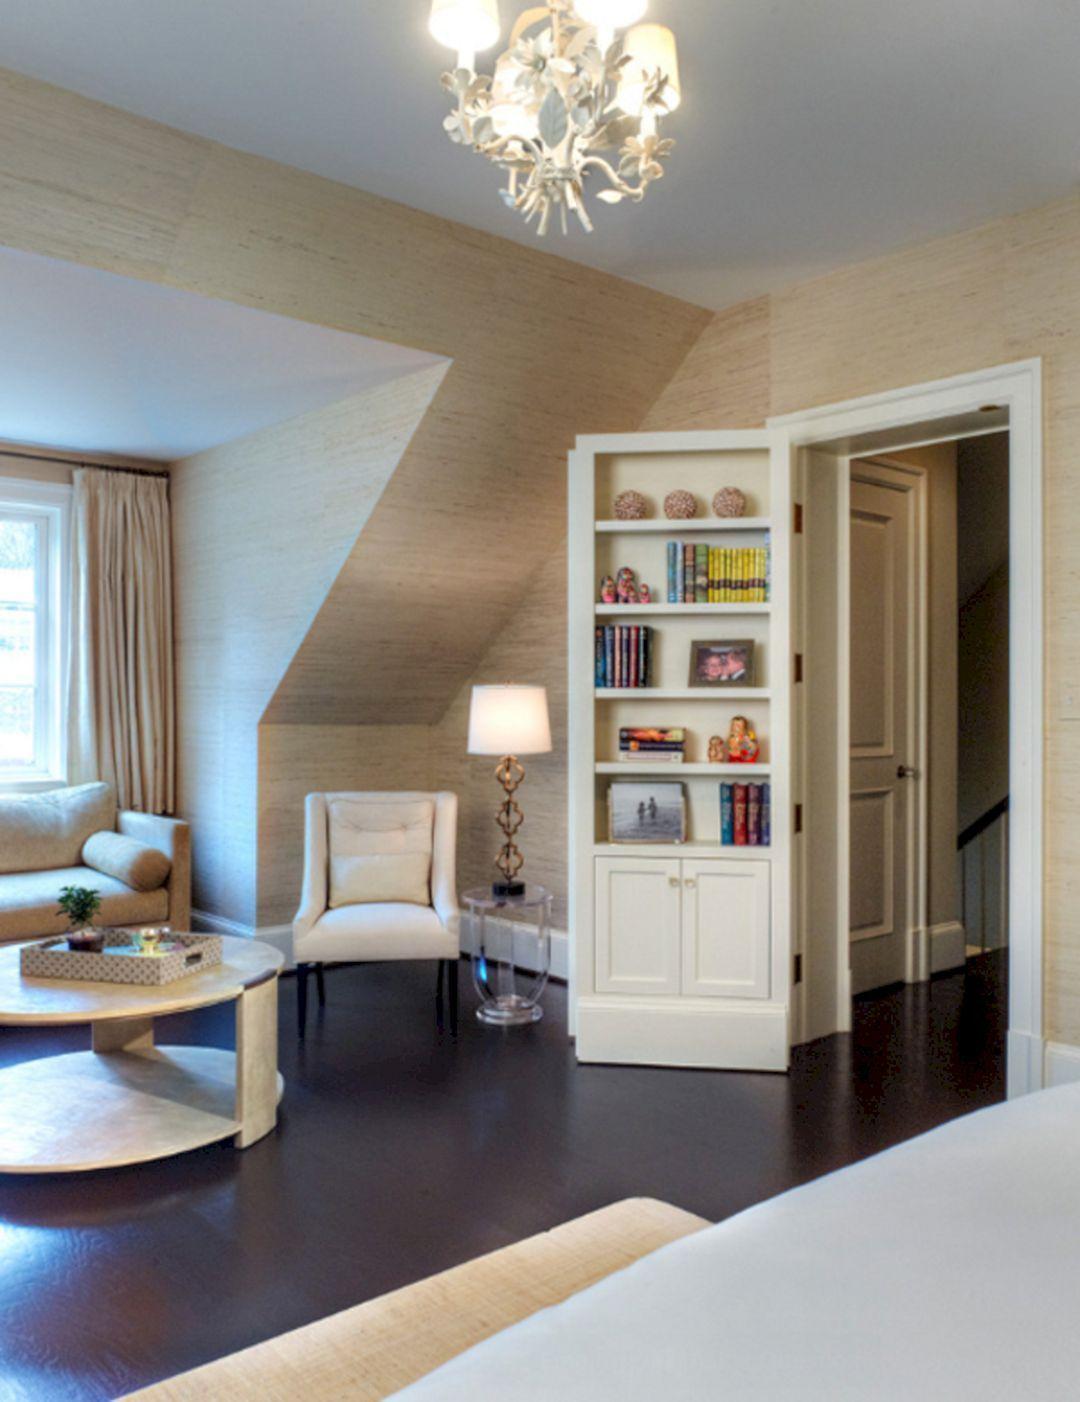 42 Incredible Secret Room Design Ideas To Inspire You ...